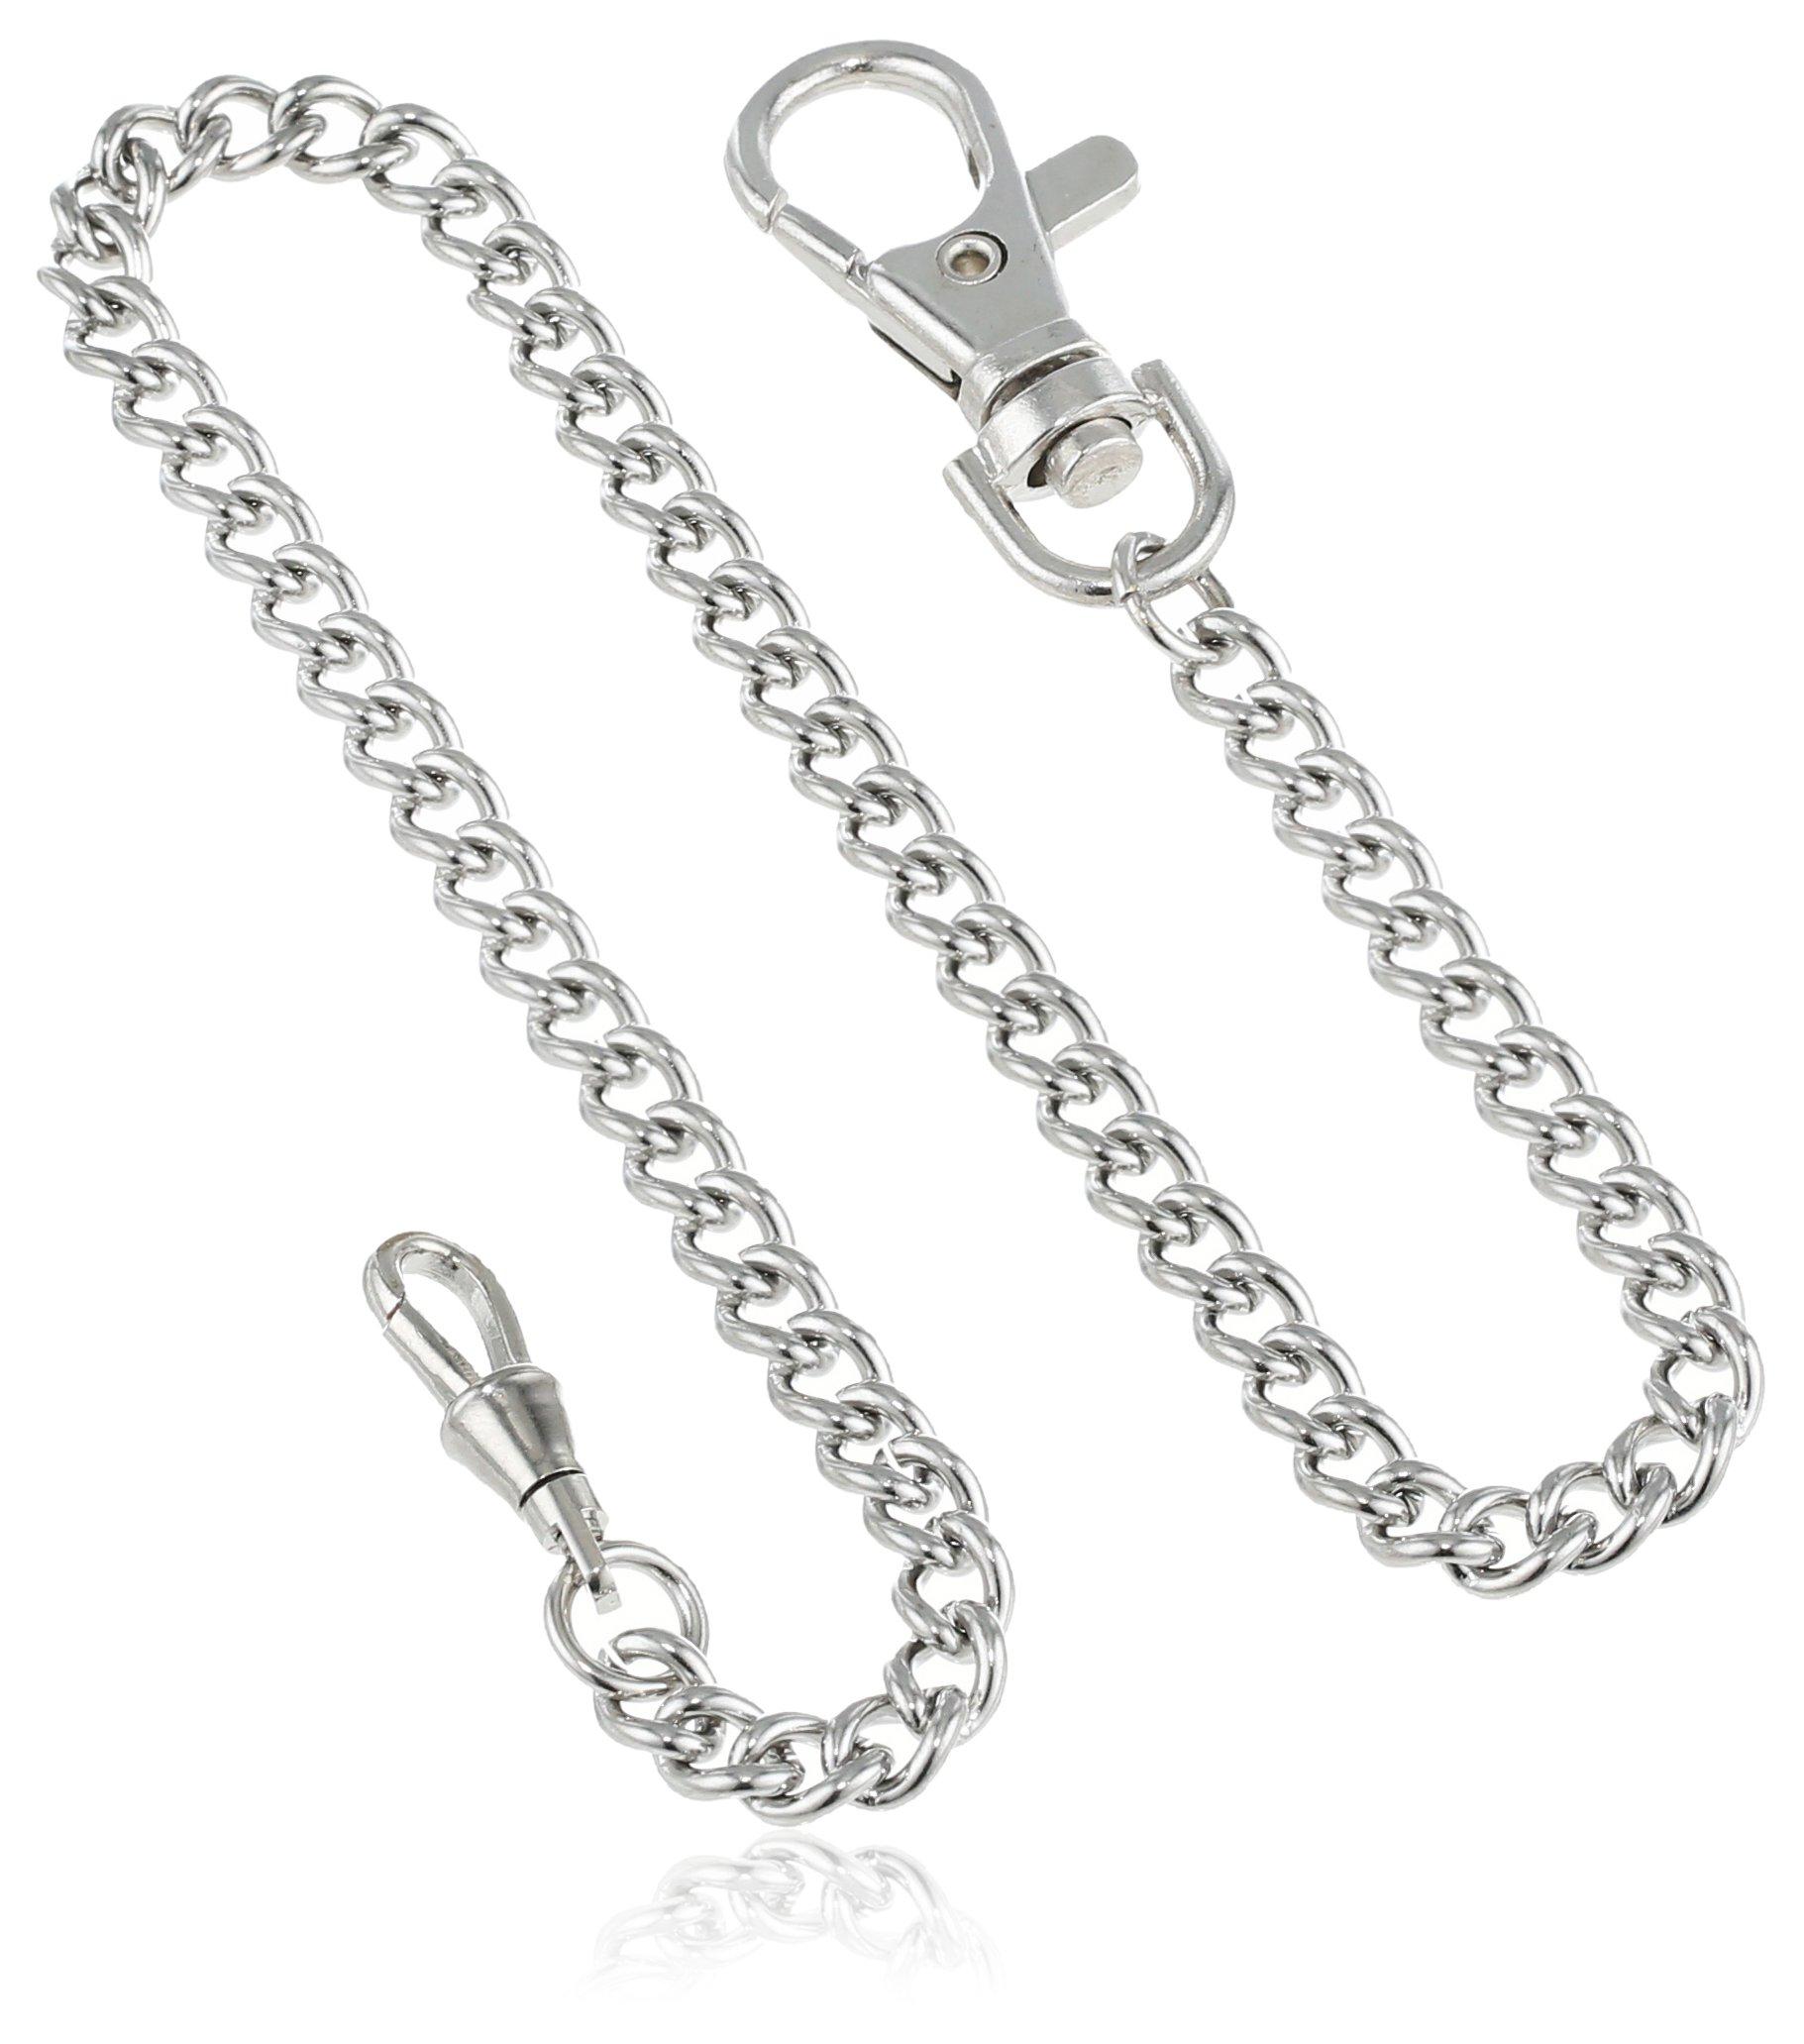 Charles-Hubert, Paris 3548-W Stainless Steel Pocket Watch Chain by CHARLES-HUBERT PARIS